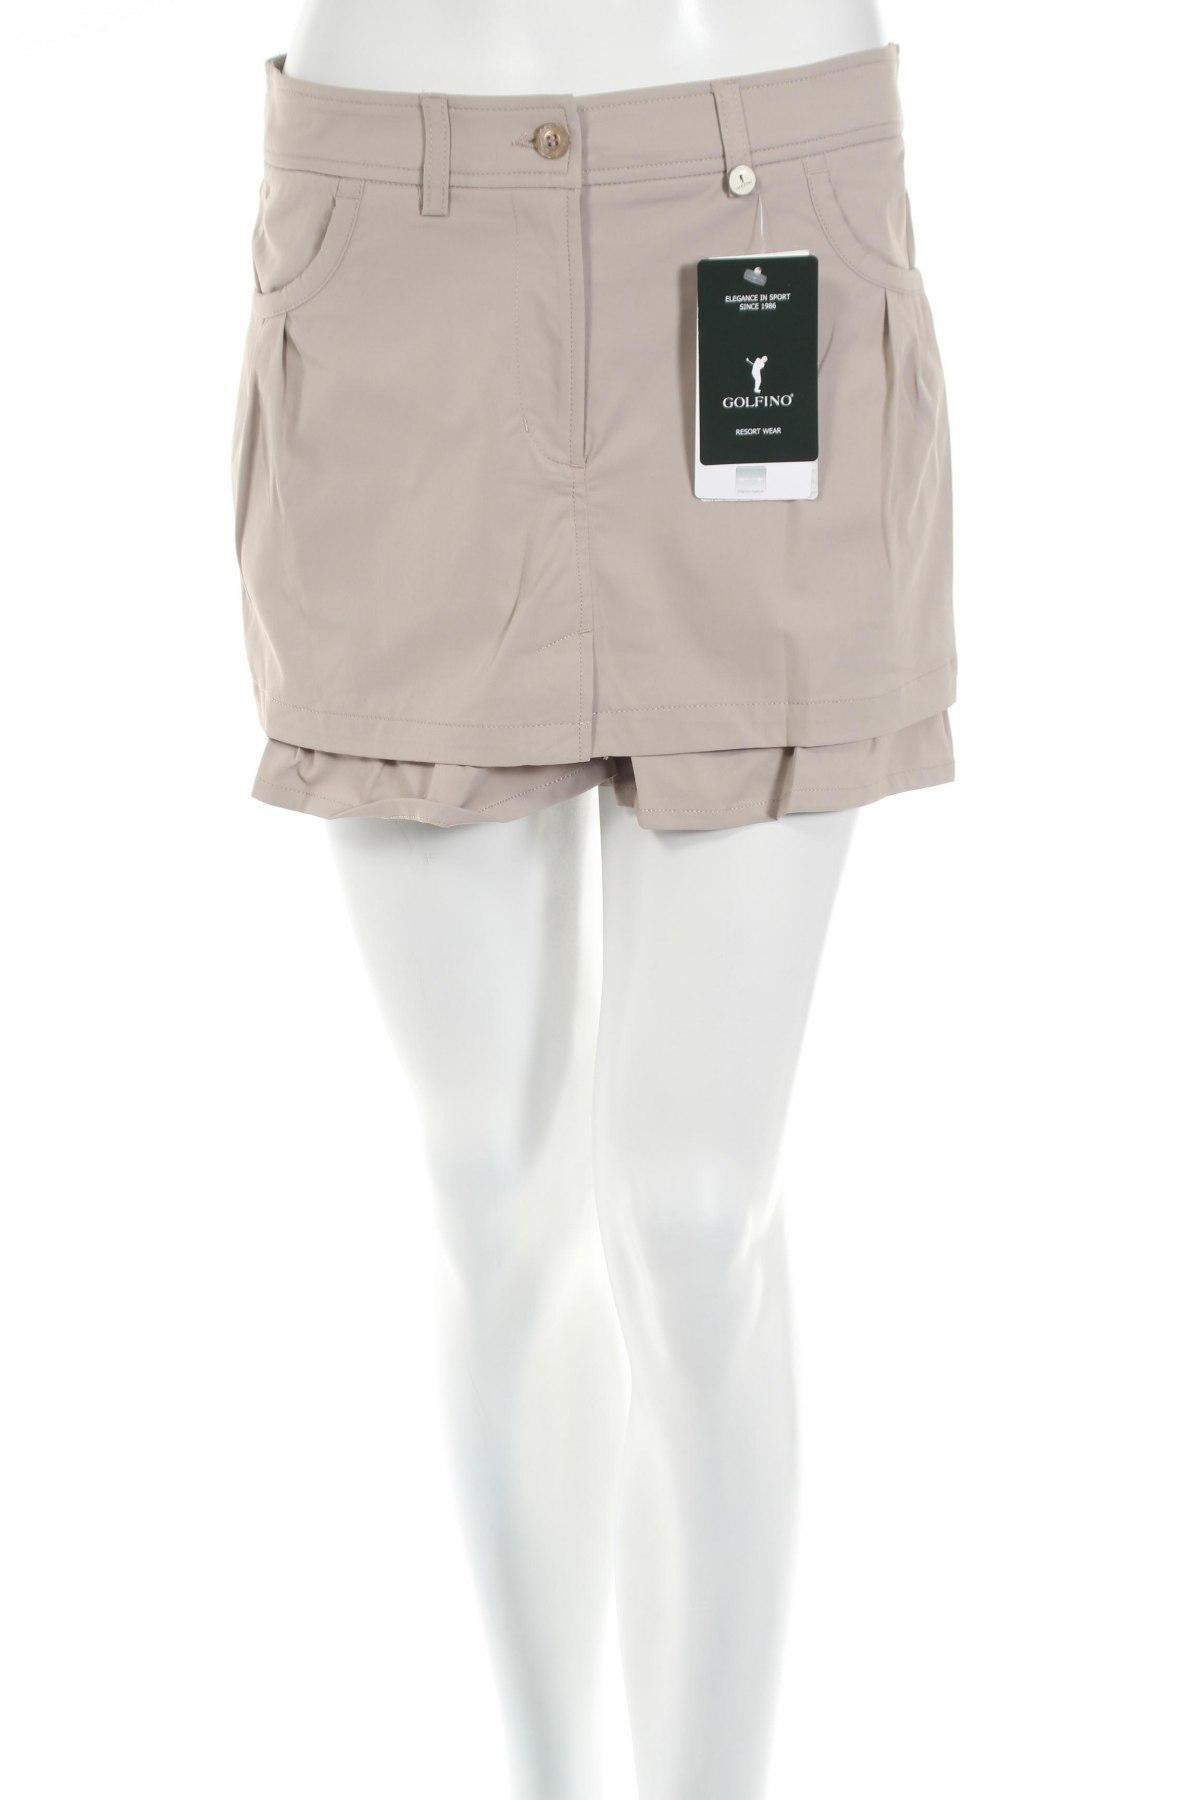 Пола - панталон Golfino, Размер S, Цвят Бежов, 96% полиамид, 4% еластан, Цена 18,46лв.